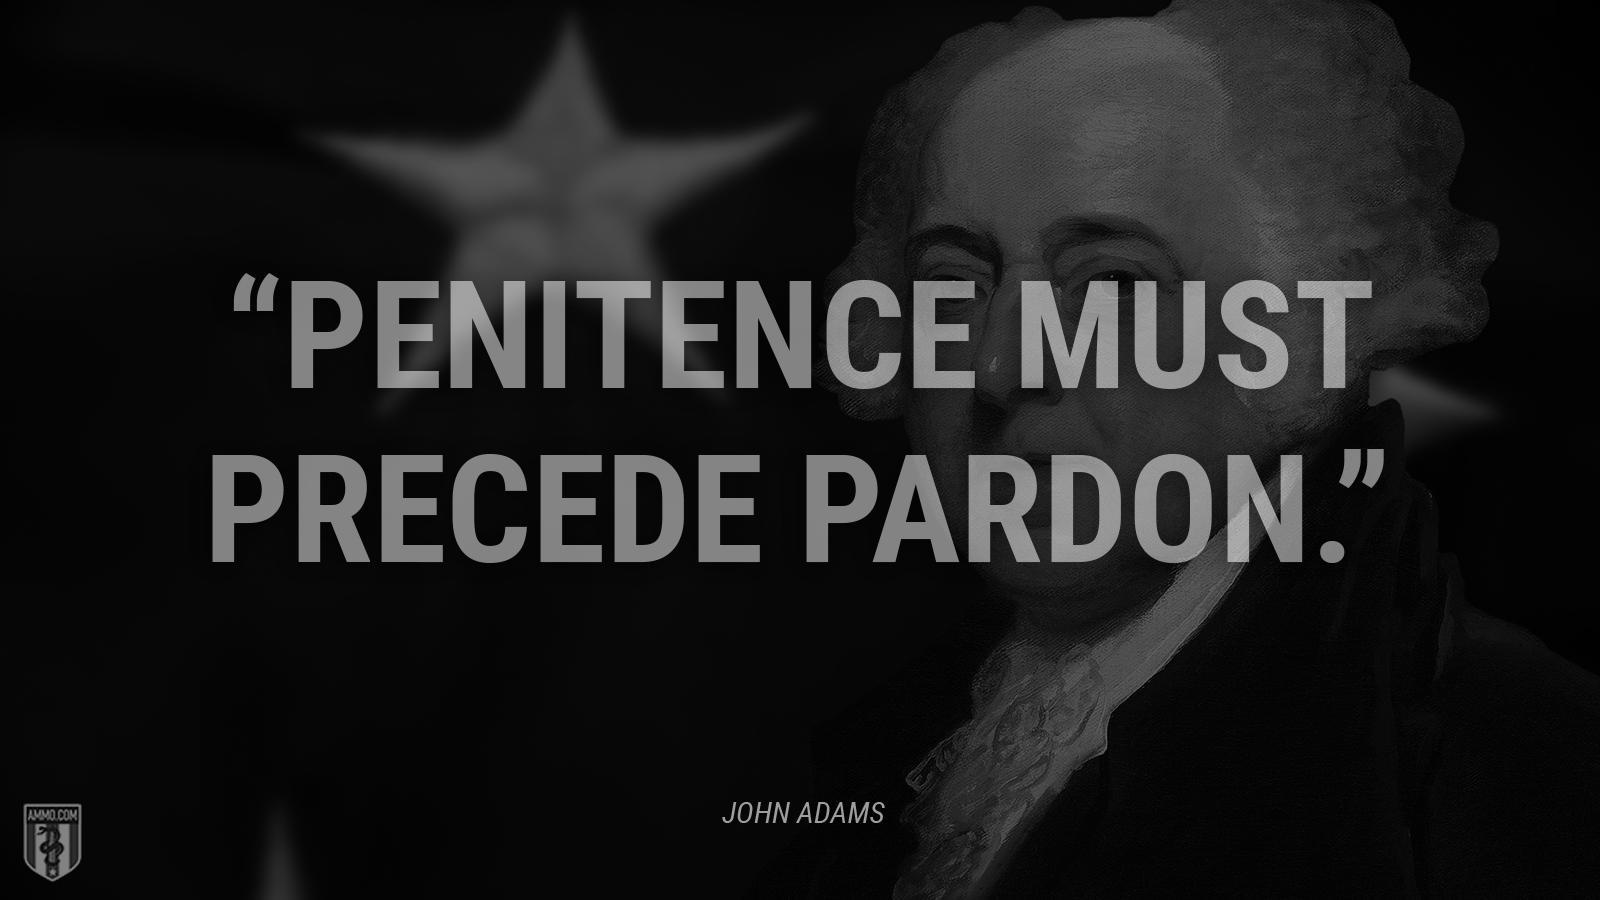 """Penitence must precede pardon."" - John Adams"